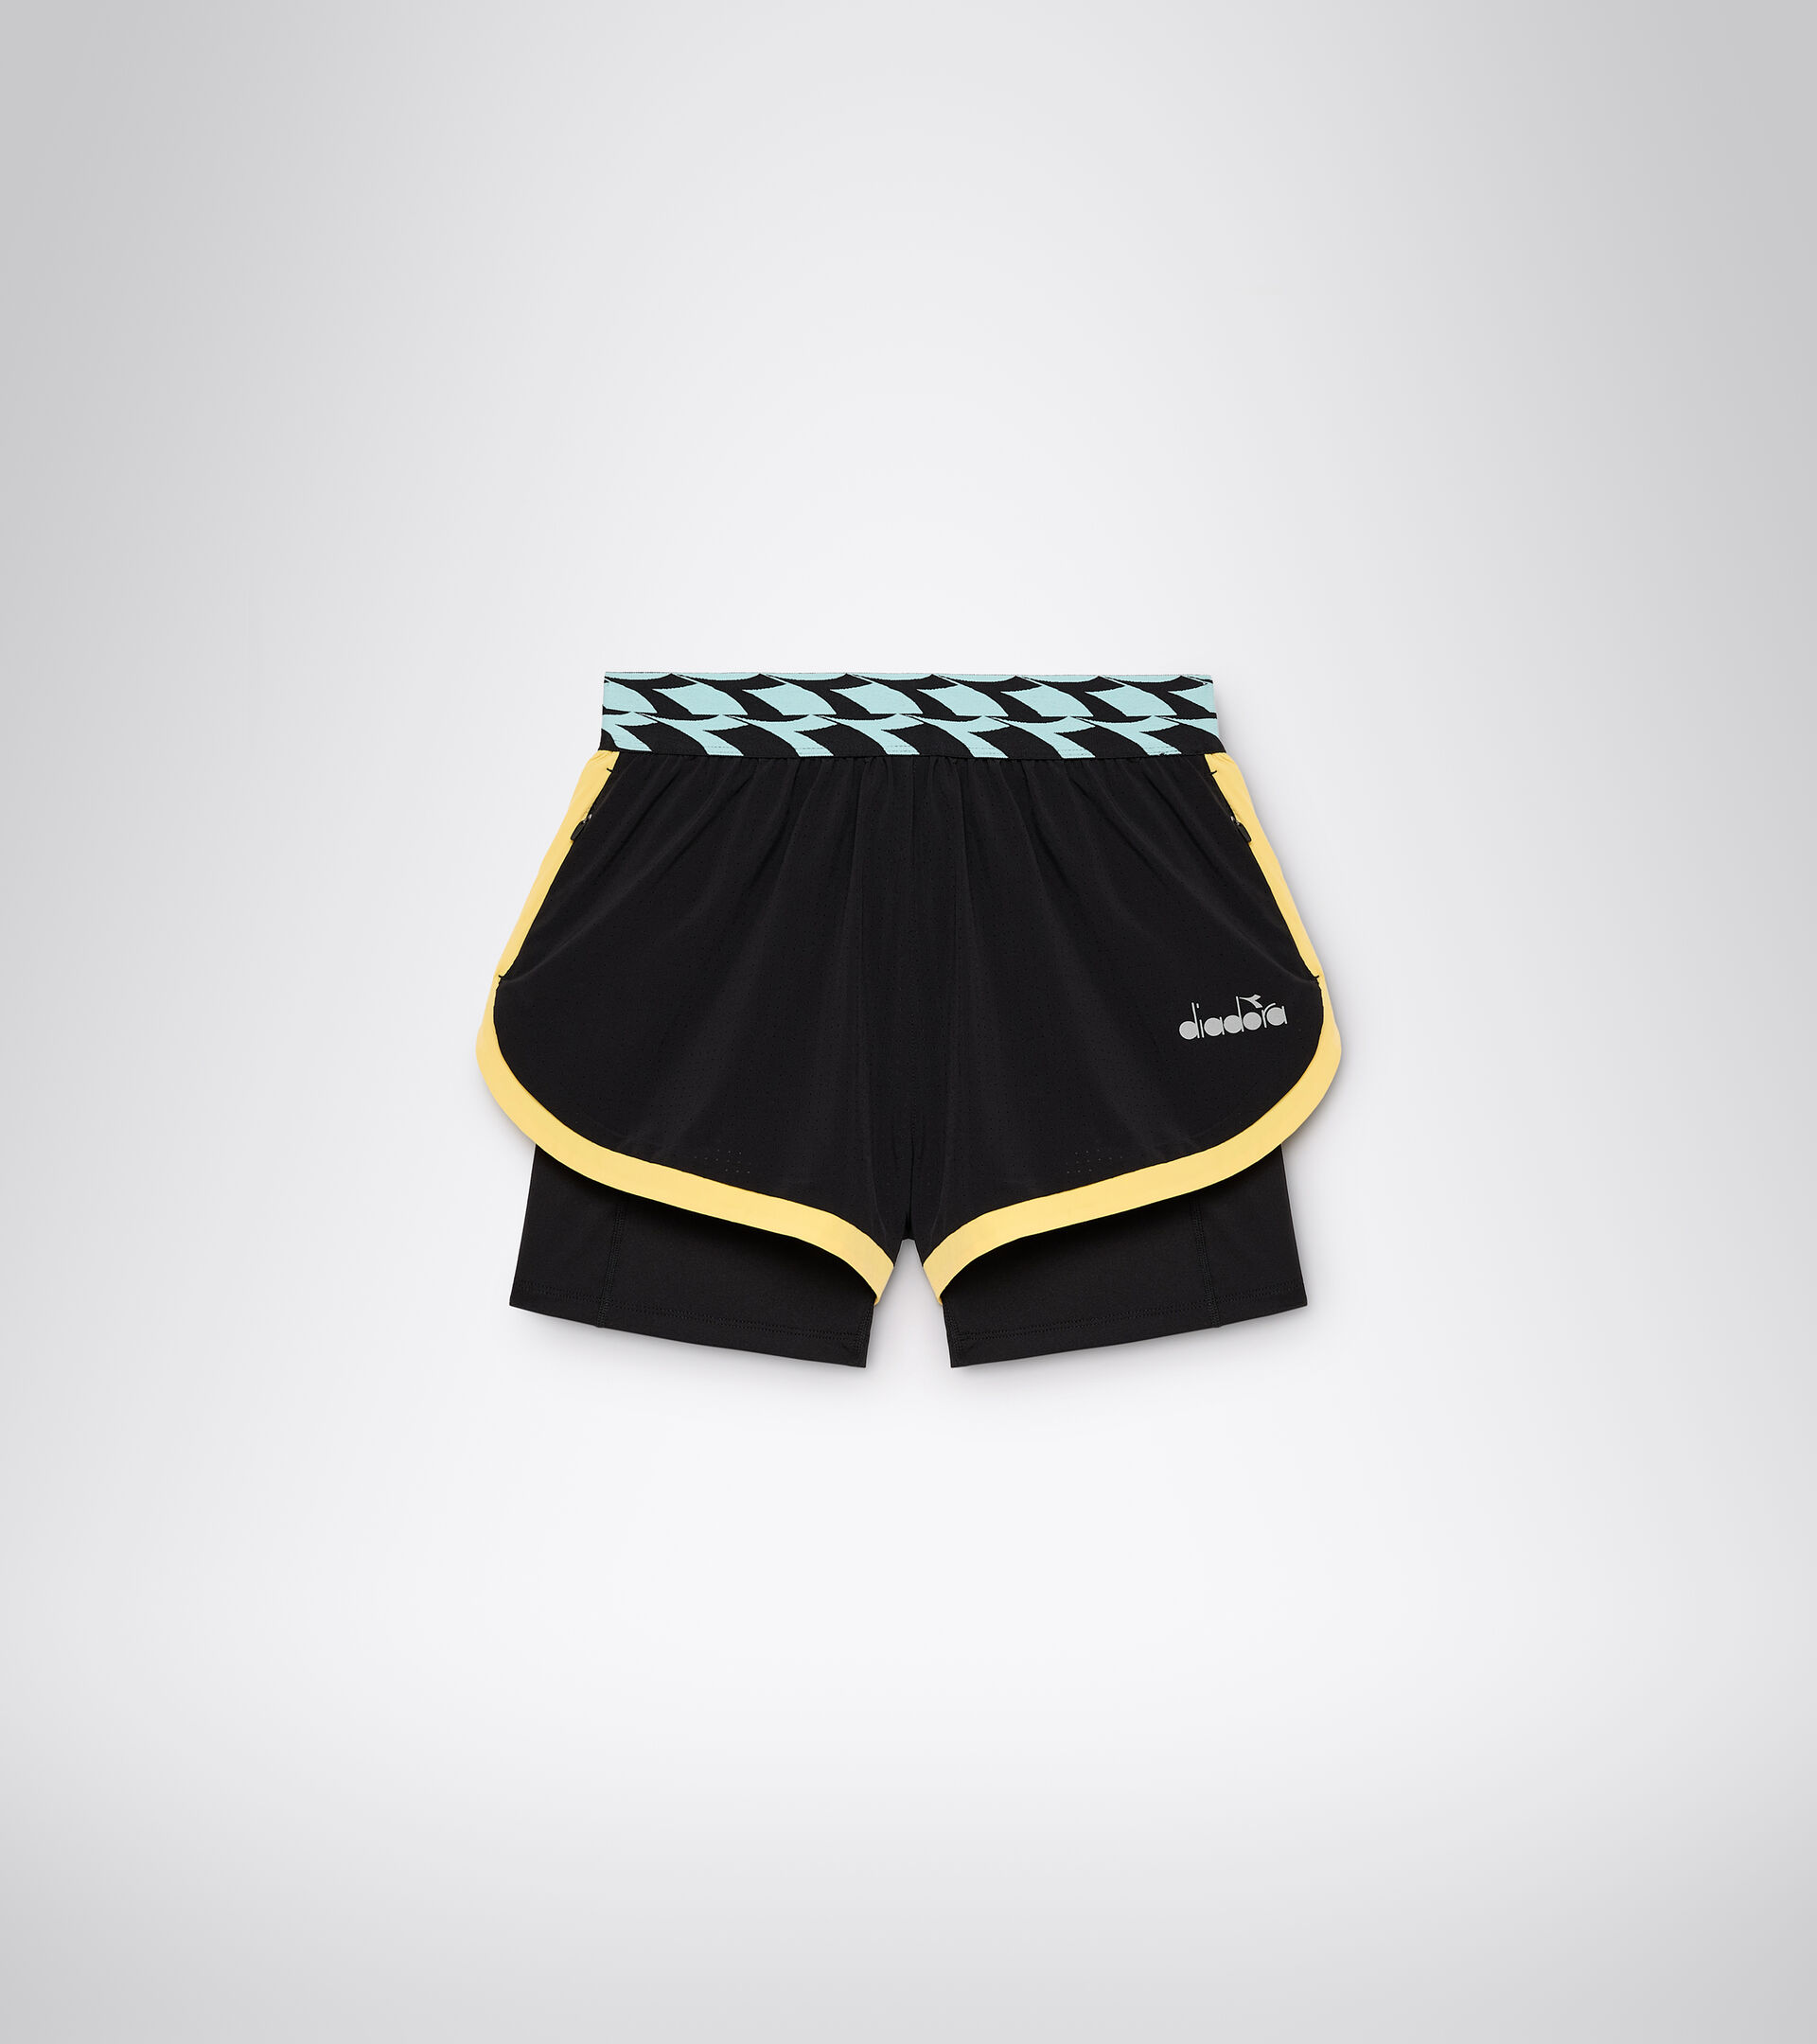 Lauf-Shorts - Damen L. DOUBLE LAYER SHORTS SCHWARZ - Diadora